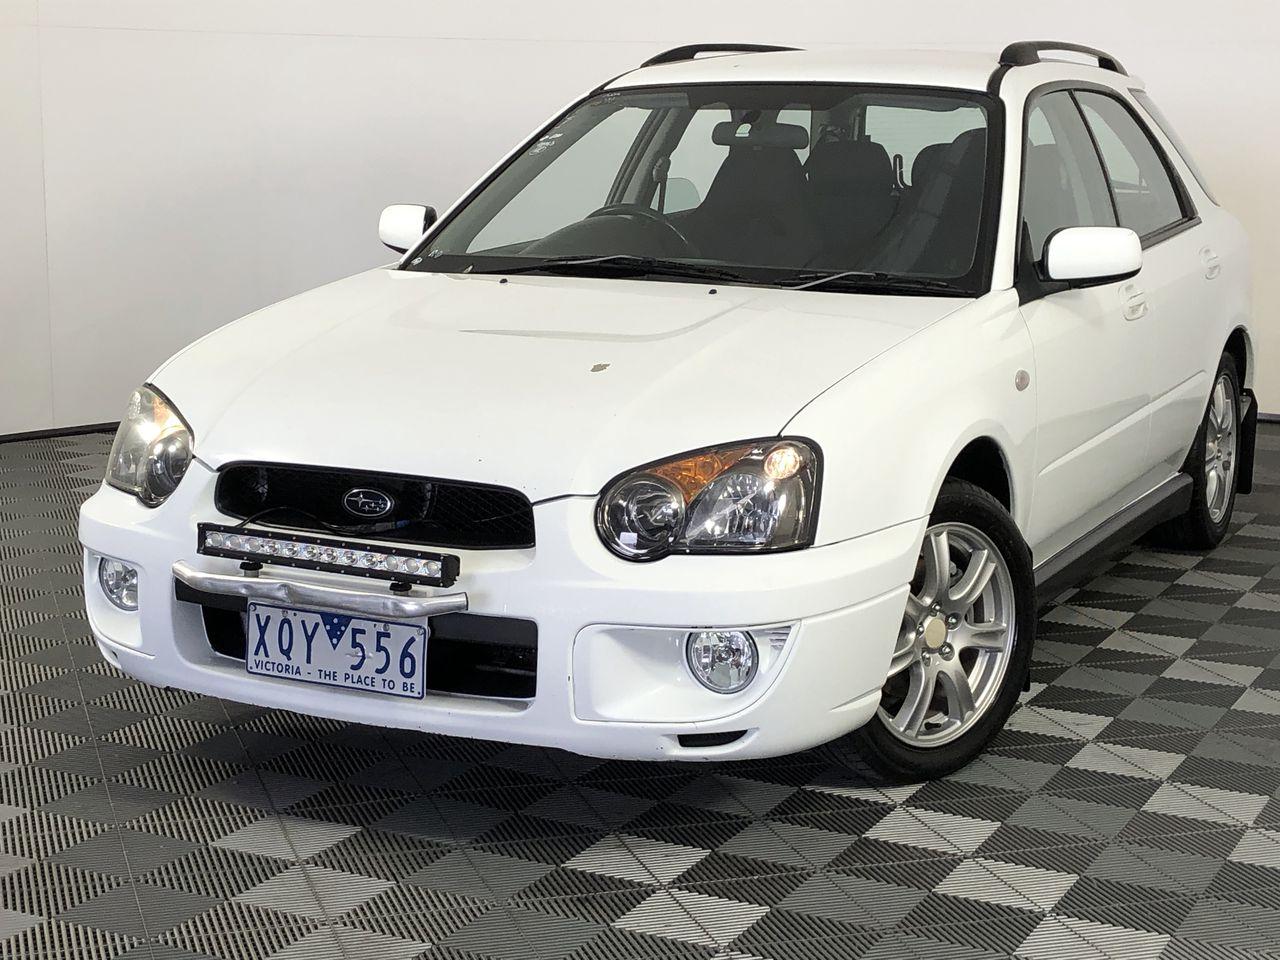 2004 Subaru Impreza RS (AWD) G2 Manual Hatchback